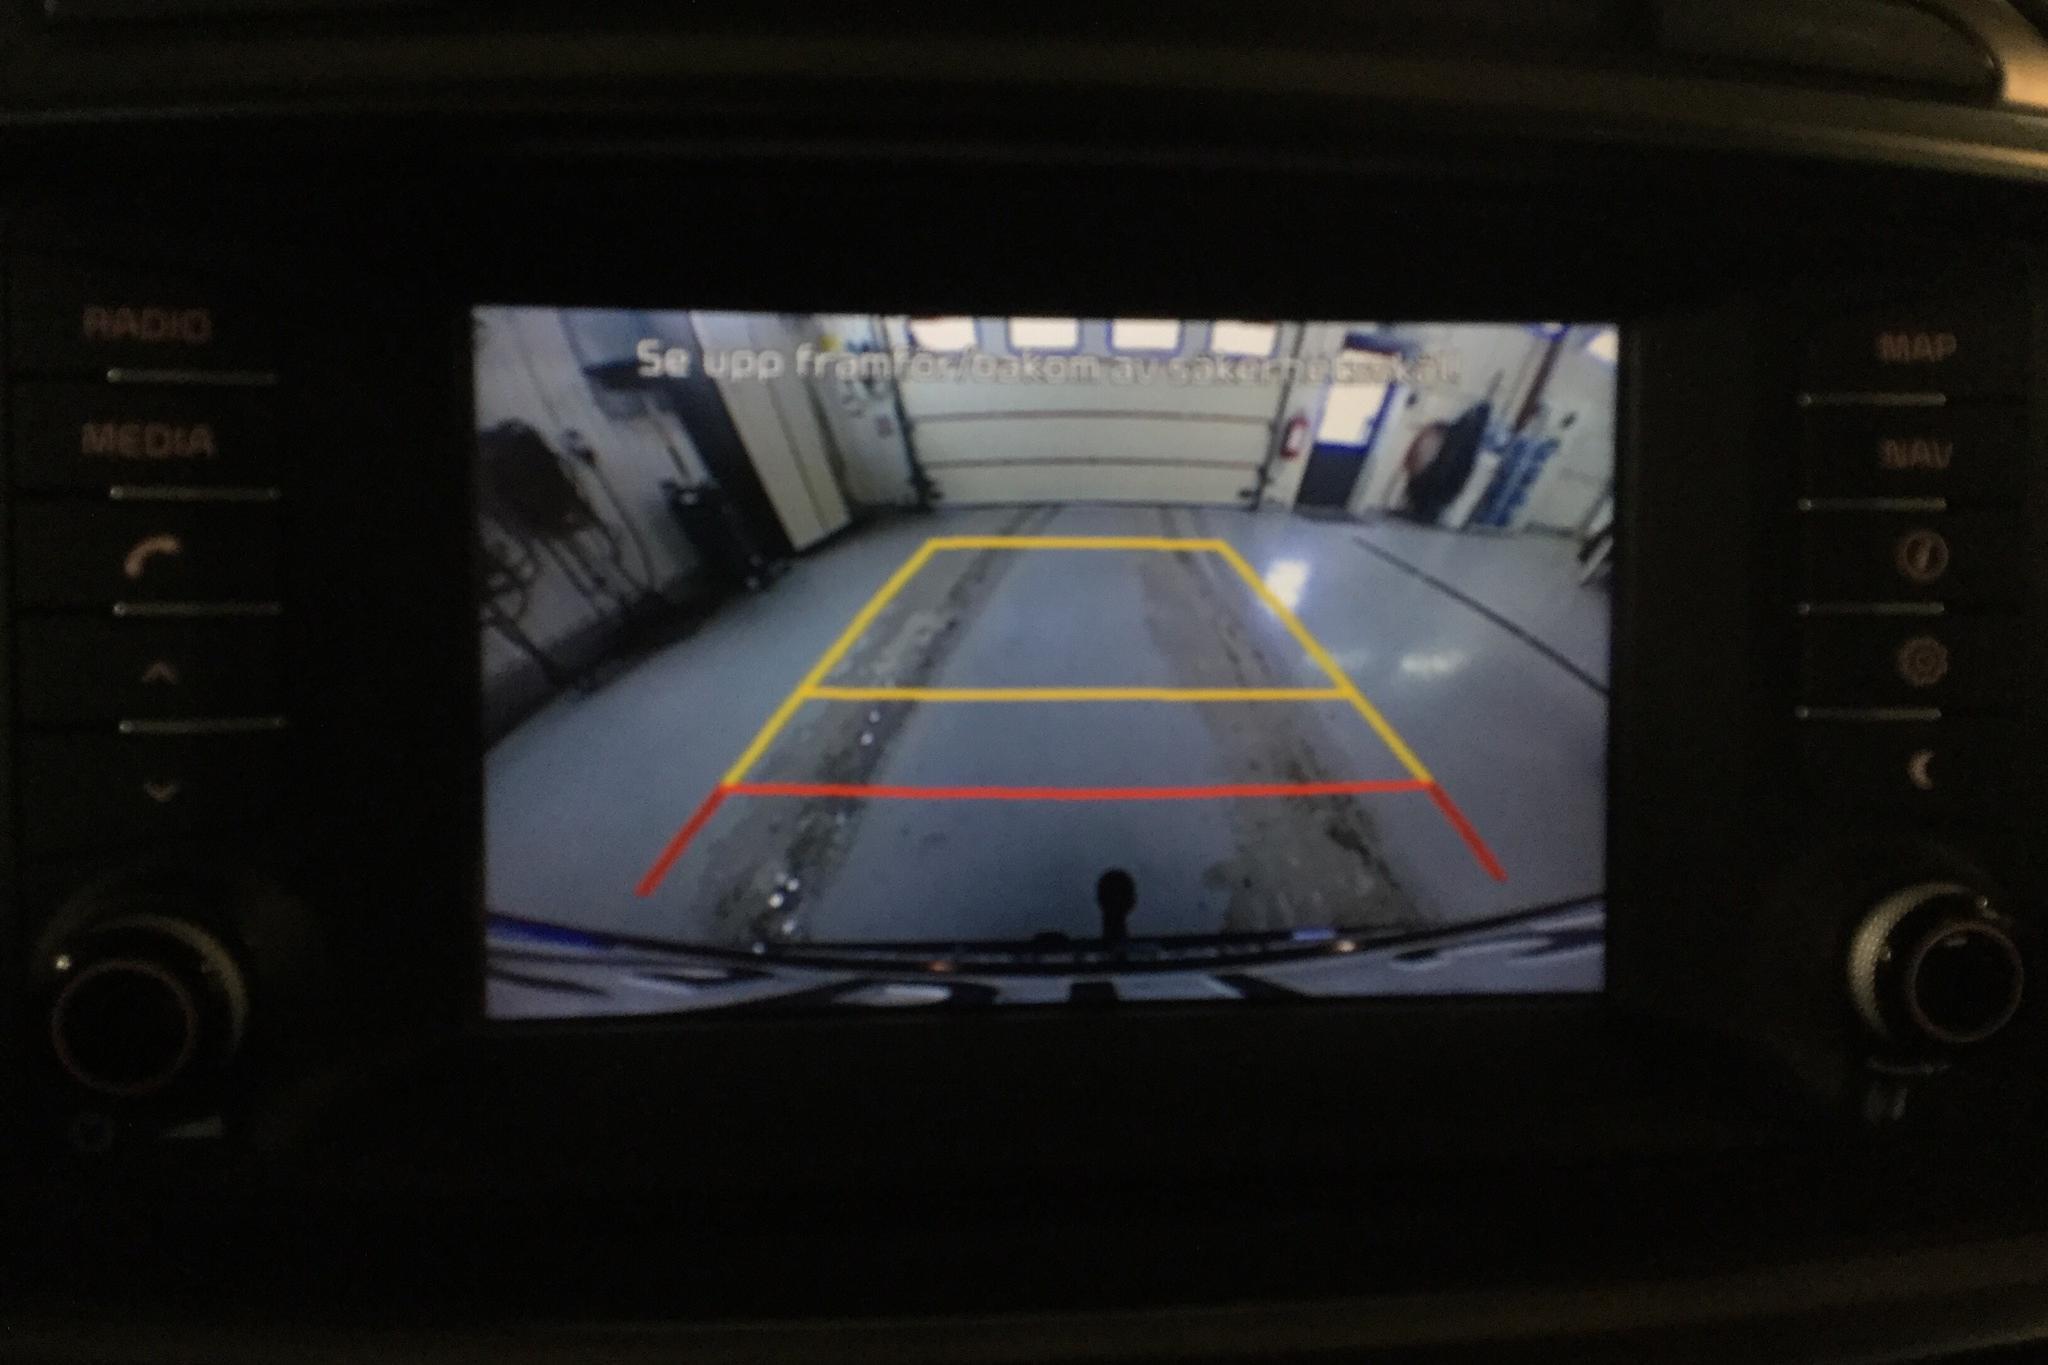 KIA Sorento 2.2 CRDi (200hk) - 16 356 mil - Automat - svart - 2017